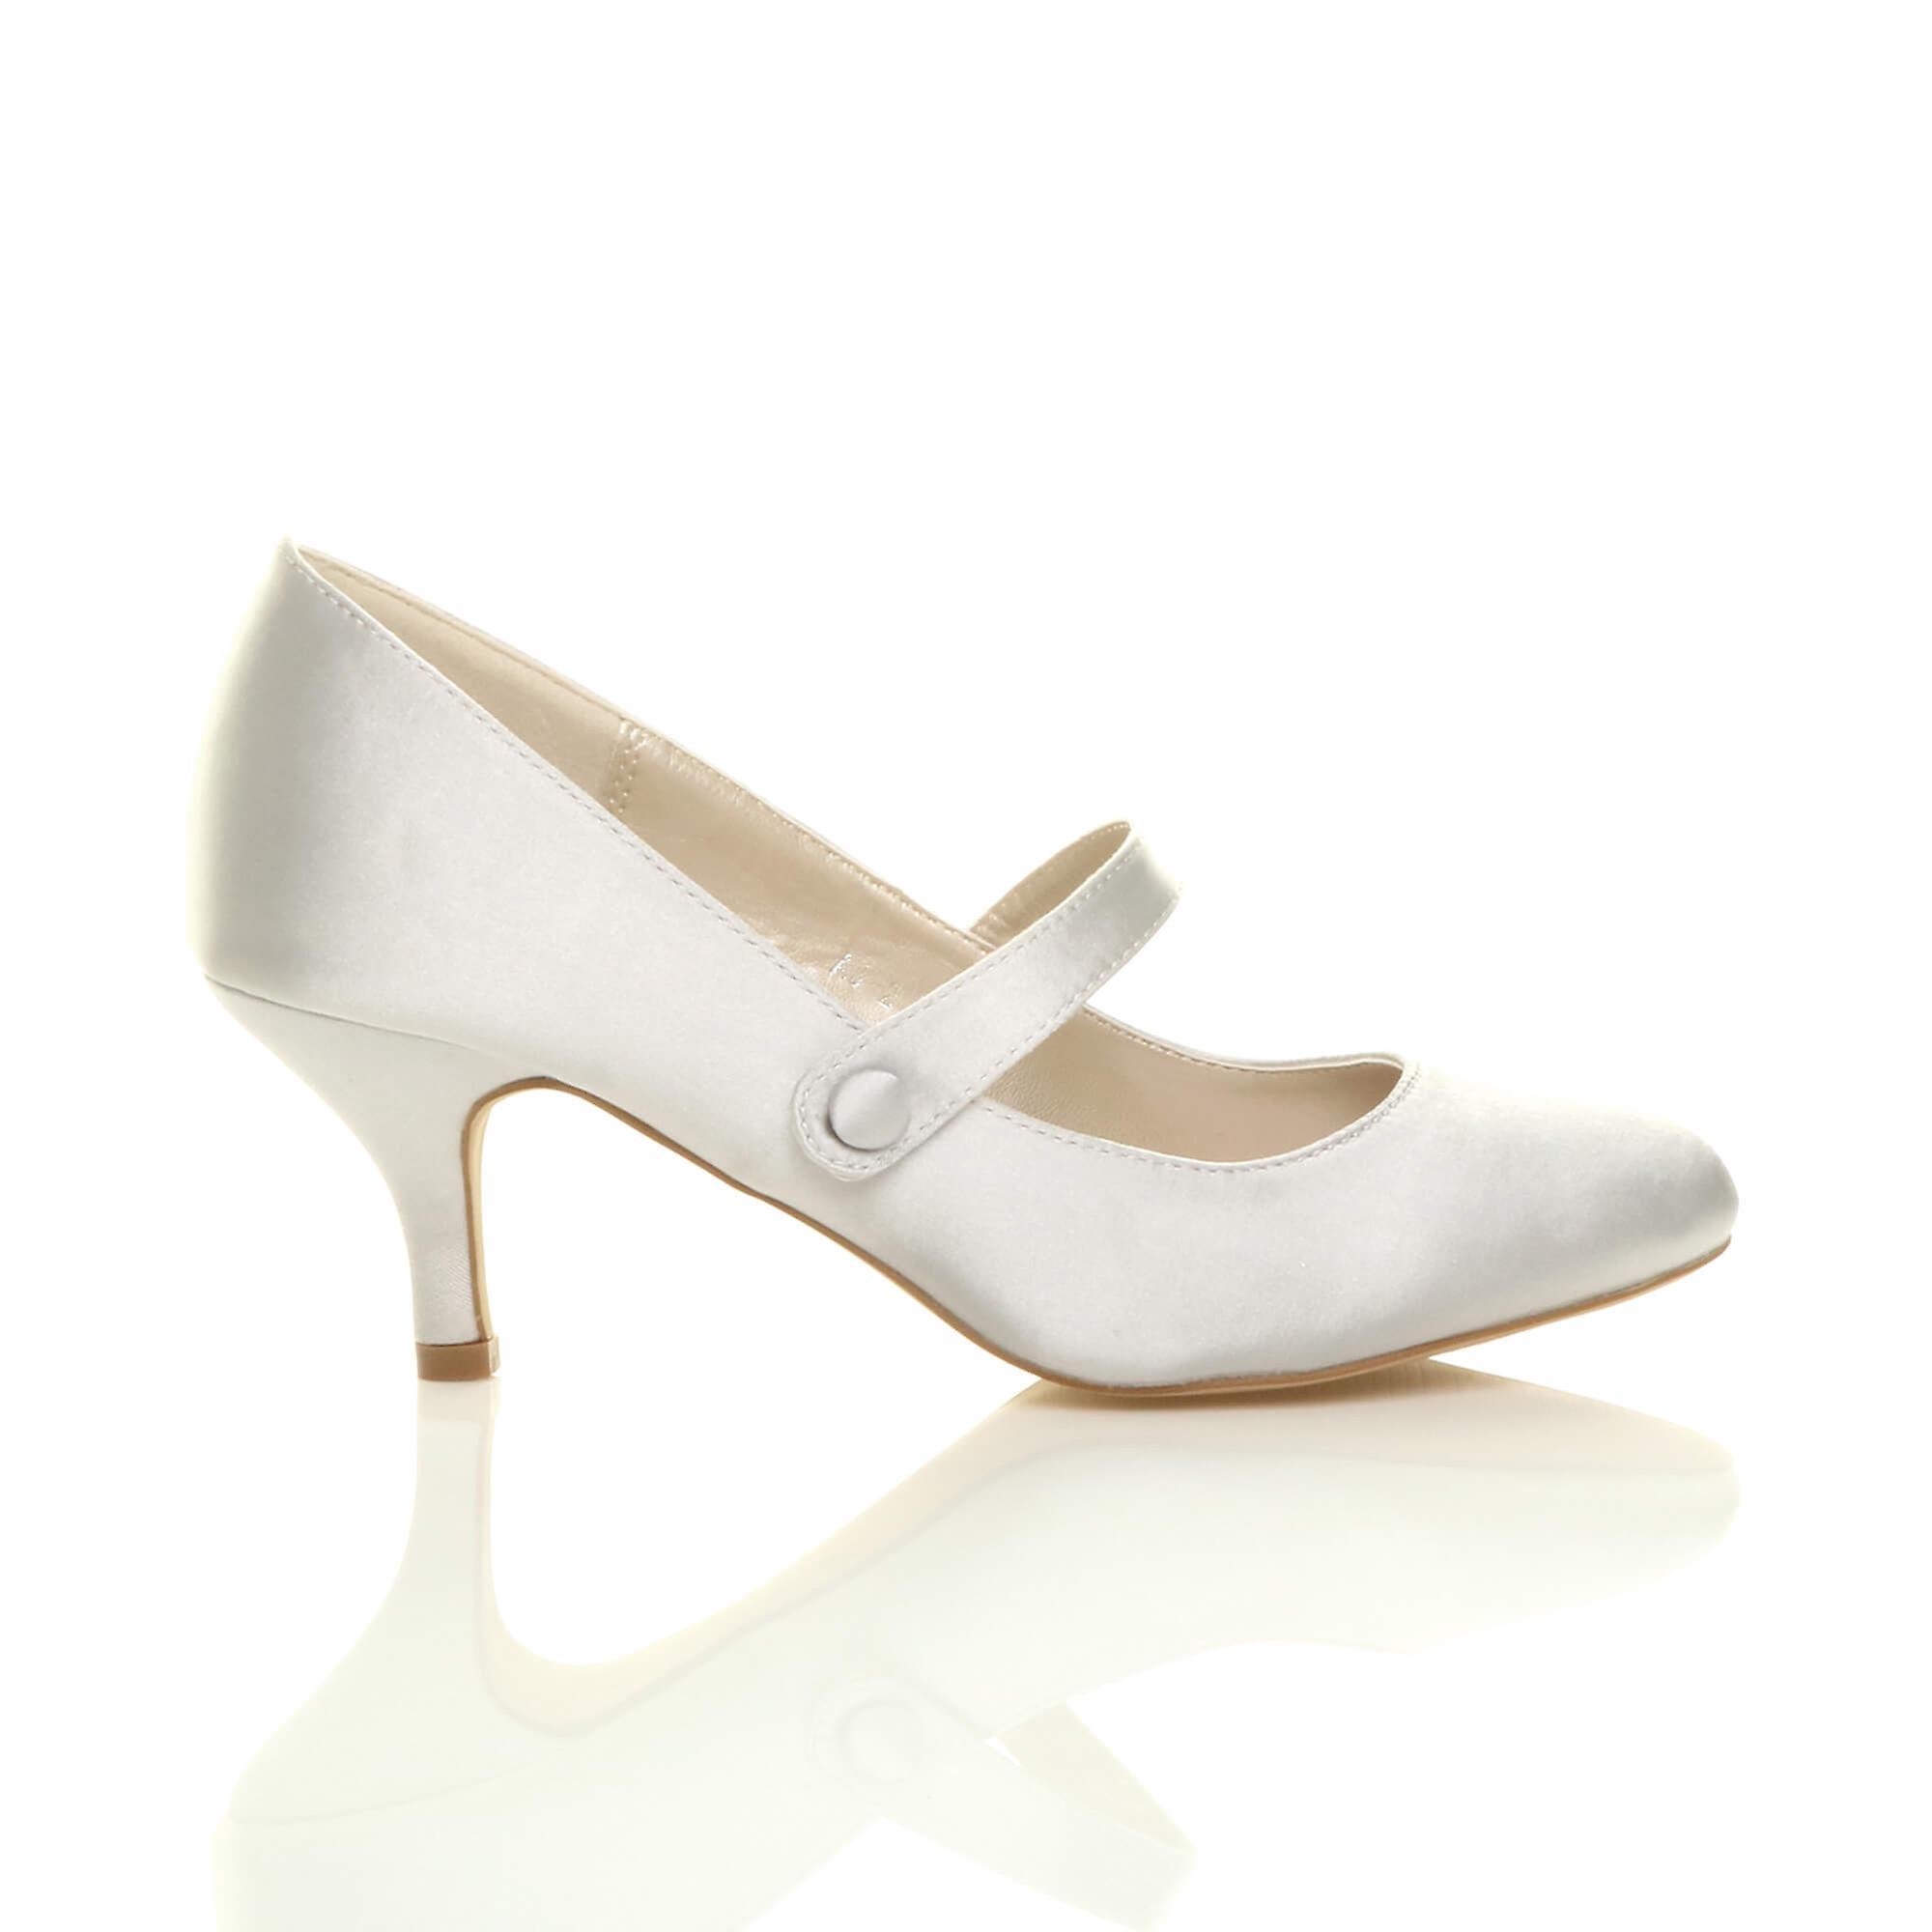 court jane mid Ajvani heel womens work pumps shoes strap party mary low qqFZzwU